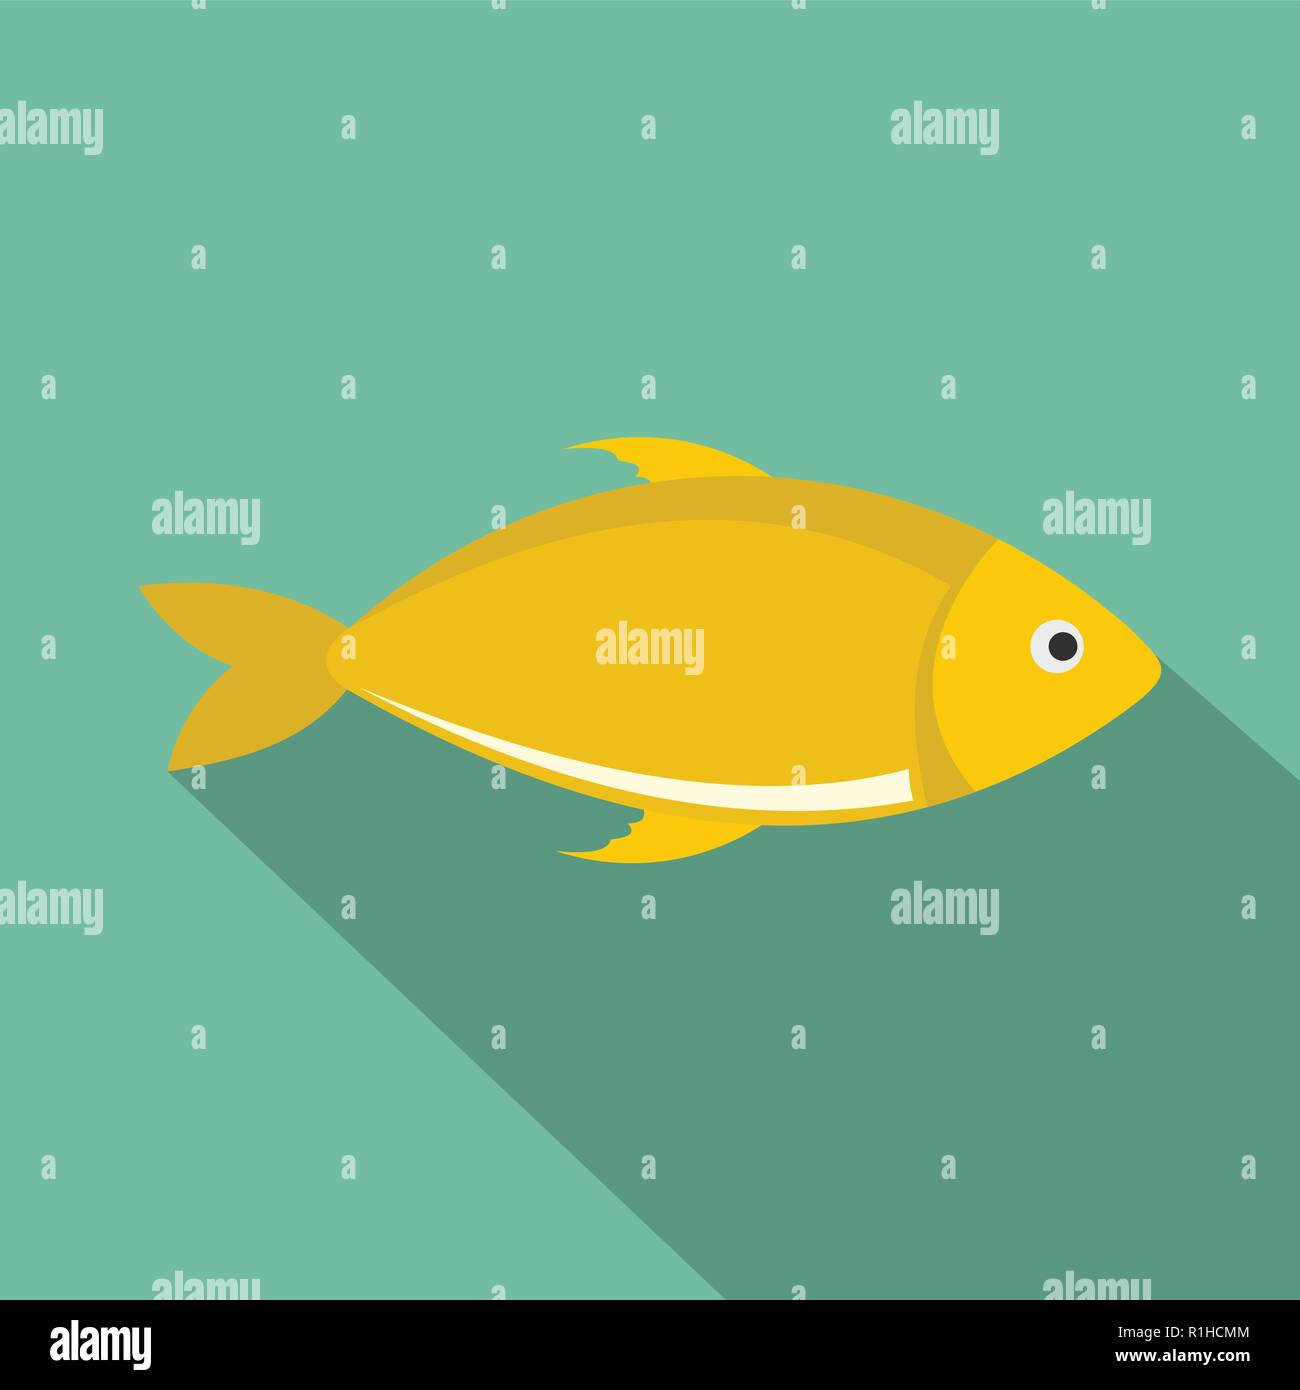 Cartoon talking fish — Stock Vector © lineartestpilot #61155837